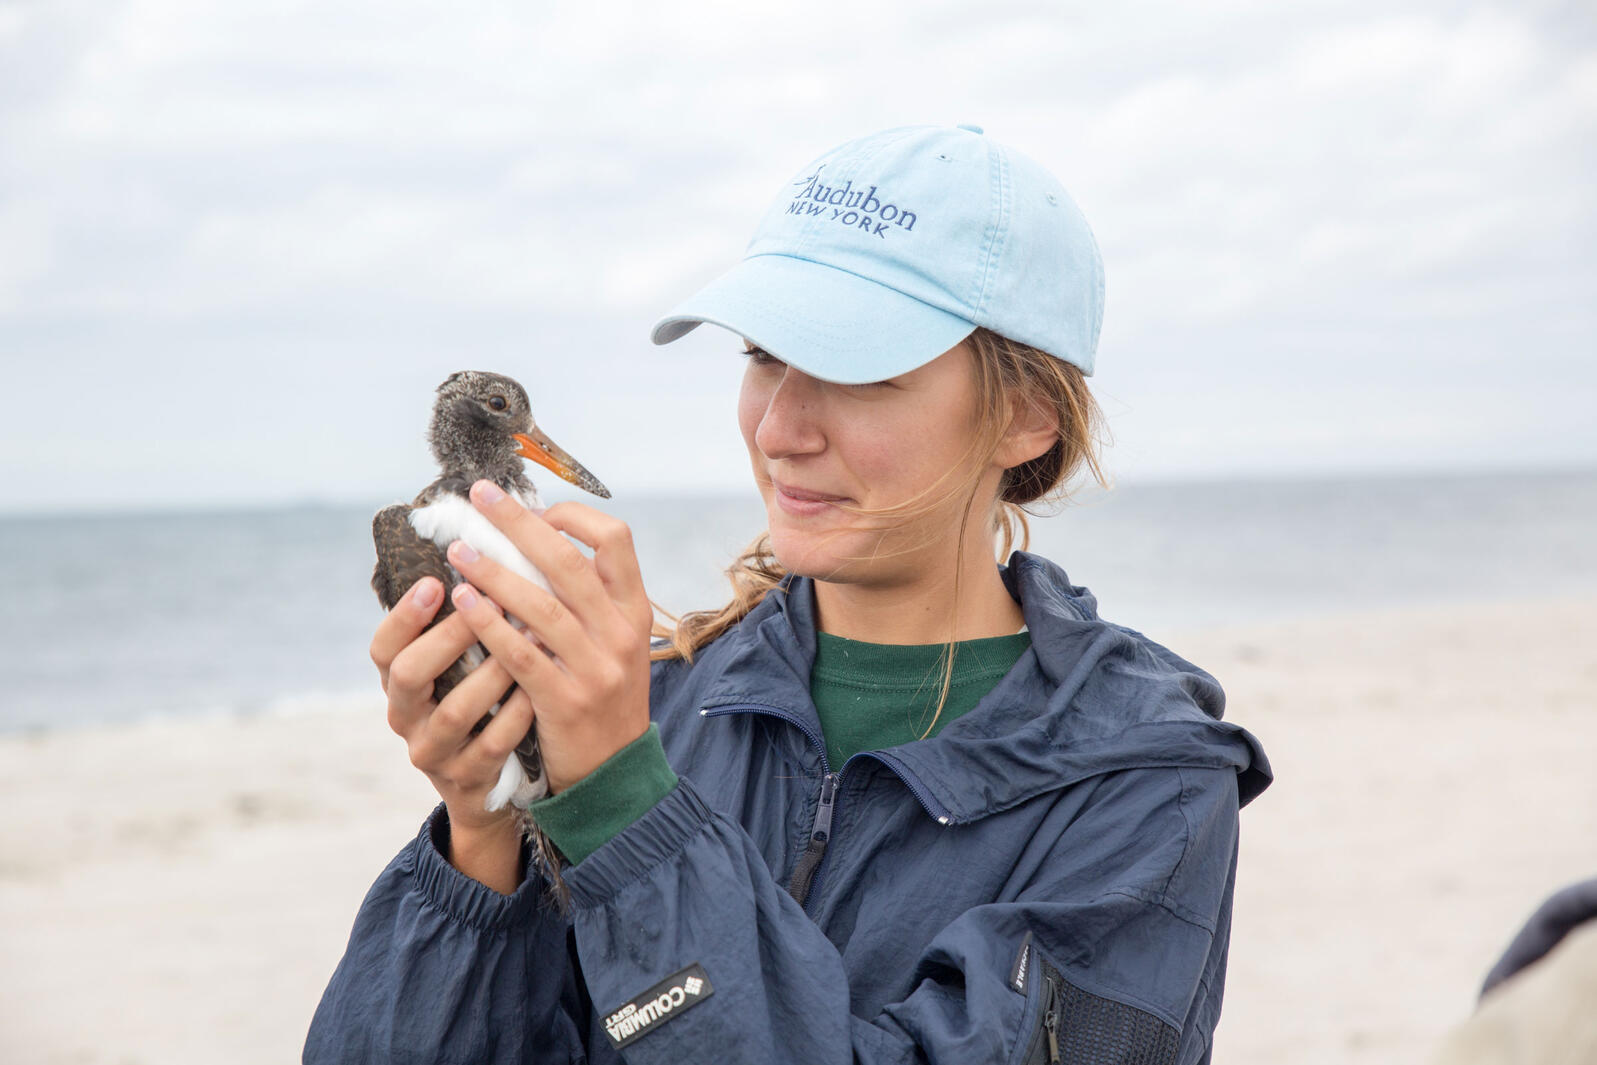 Seren Bagcilar of Audubon New York holds an American Oystercatcher chick in preparation for tagging. Lido Beach, Long Island. Hillary Eggers/Audubon